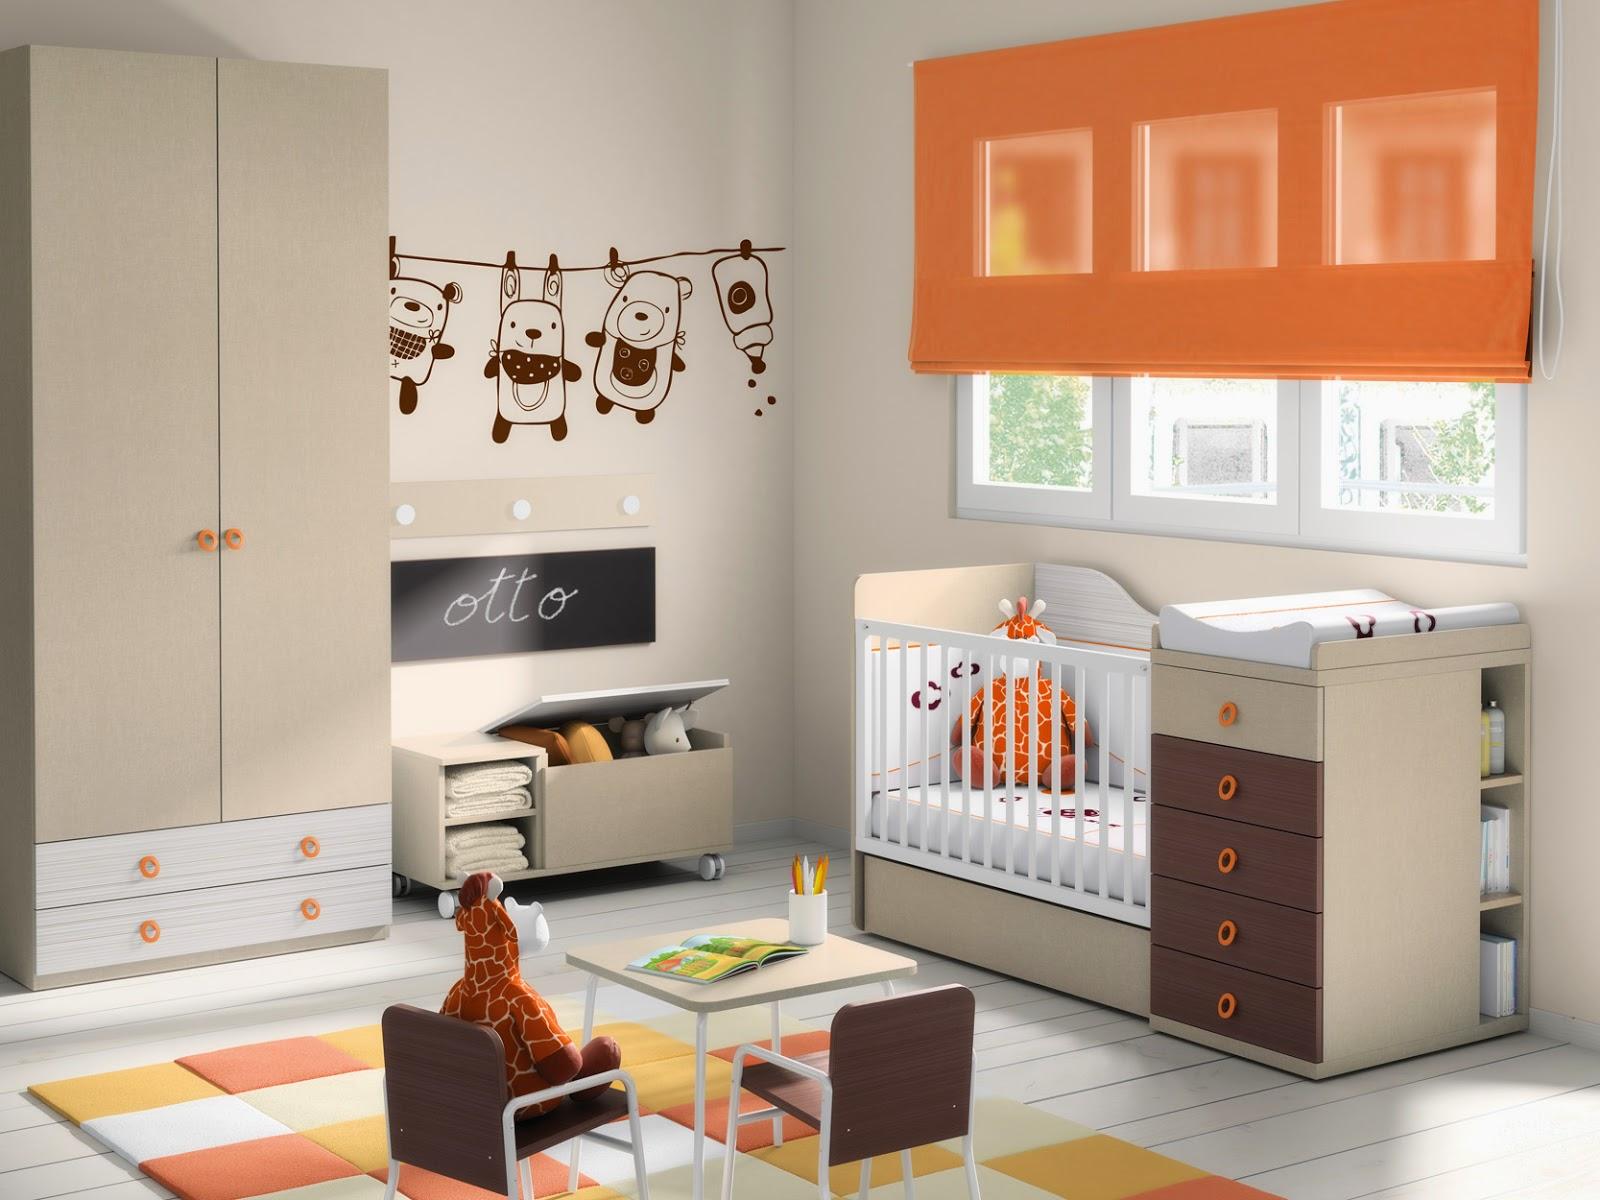 Abbina le tende alla cameretta mobili ros ros textil - Tende camerette bambini ...